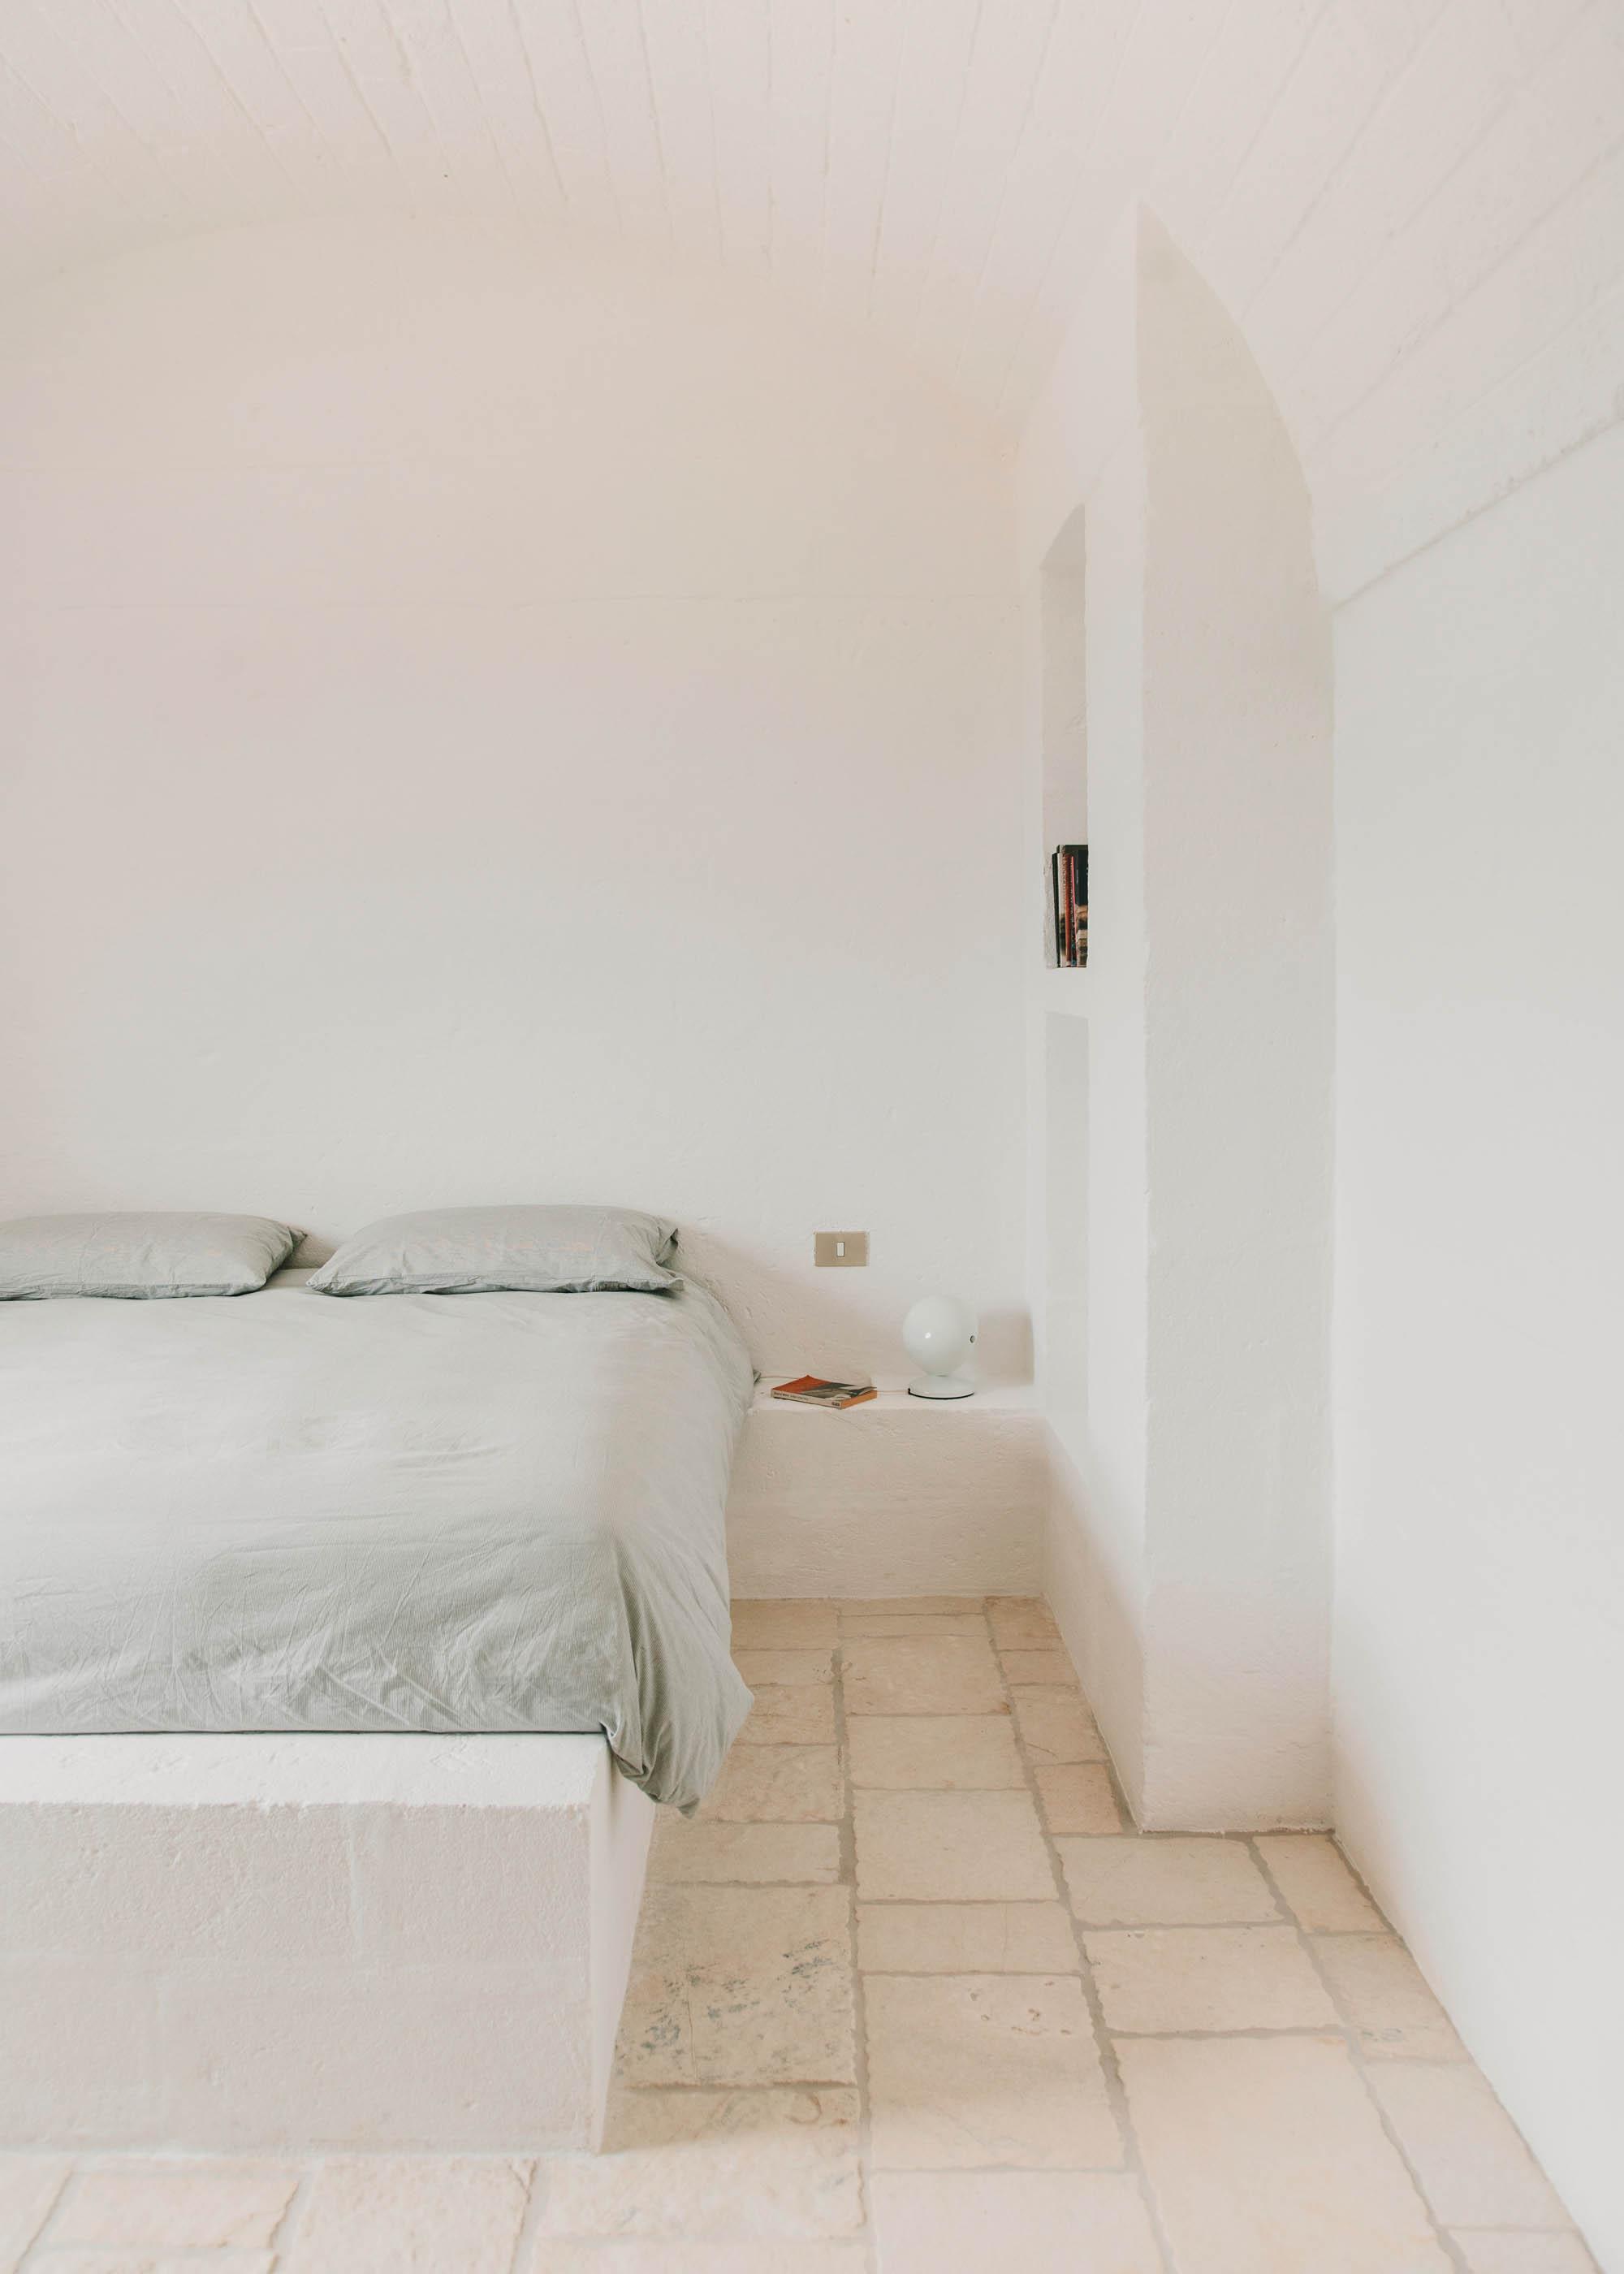 #italy #puglia #masseria #morosseta #hotels #interiors #bedroom #hotels